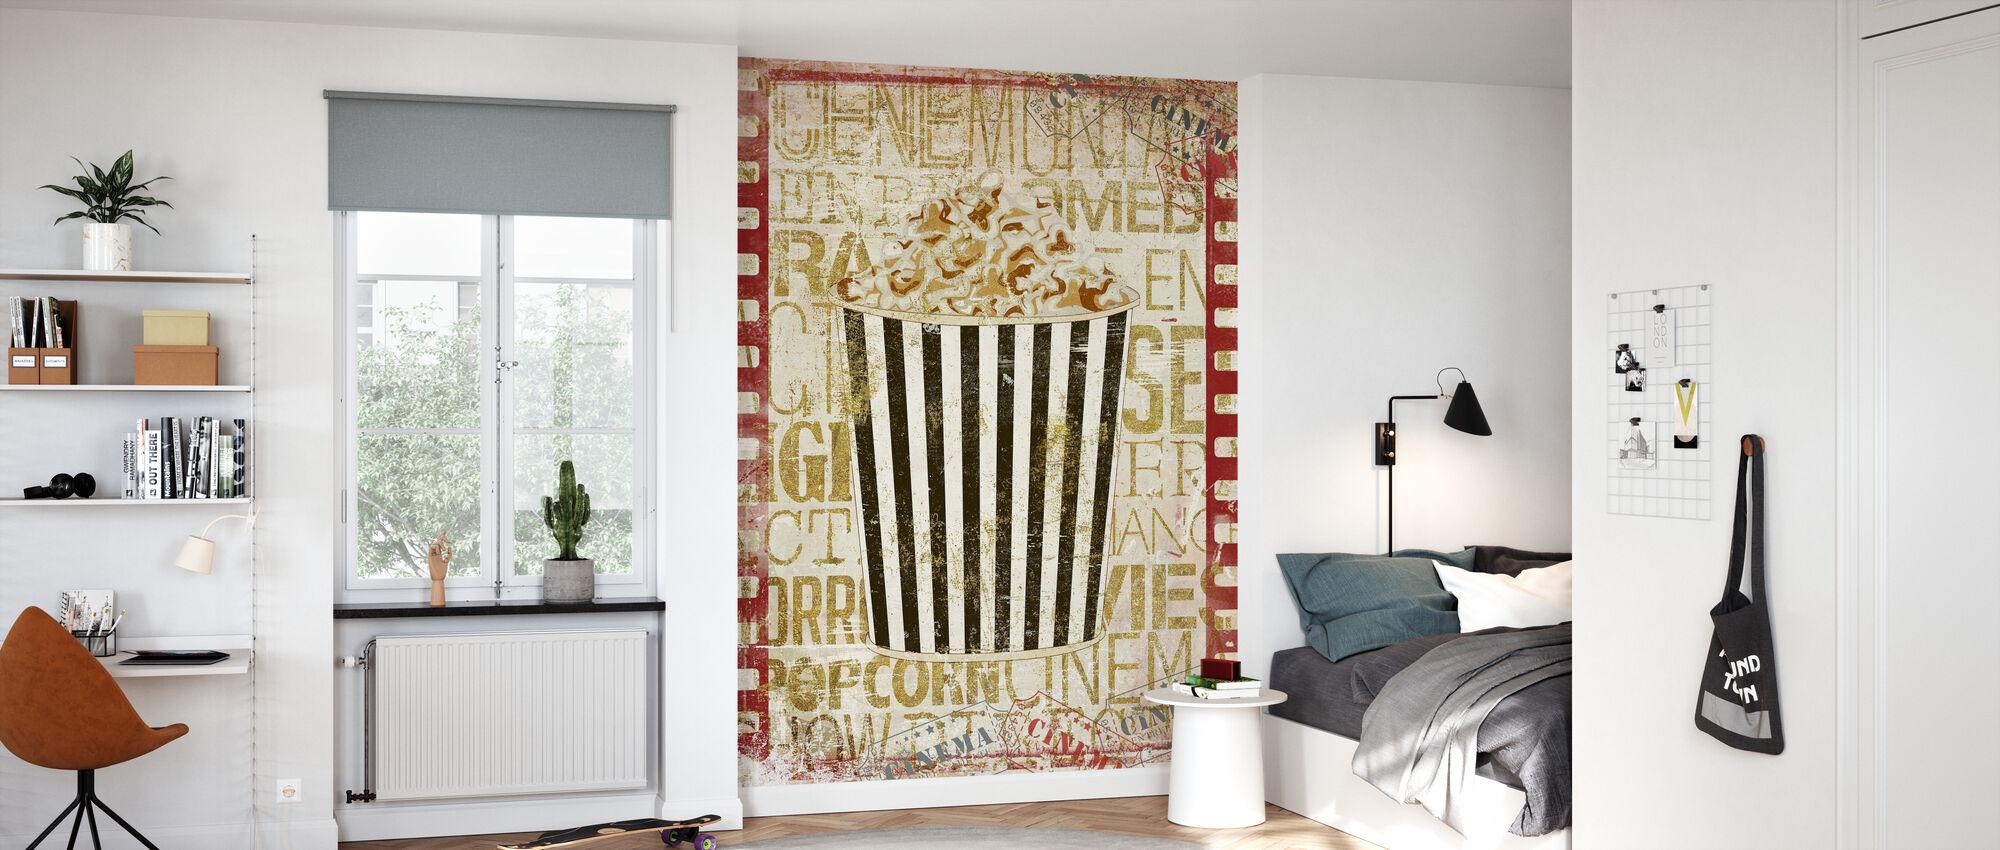 Kino Popcorn - Tapete - Kinderzimmer